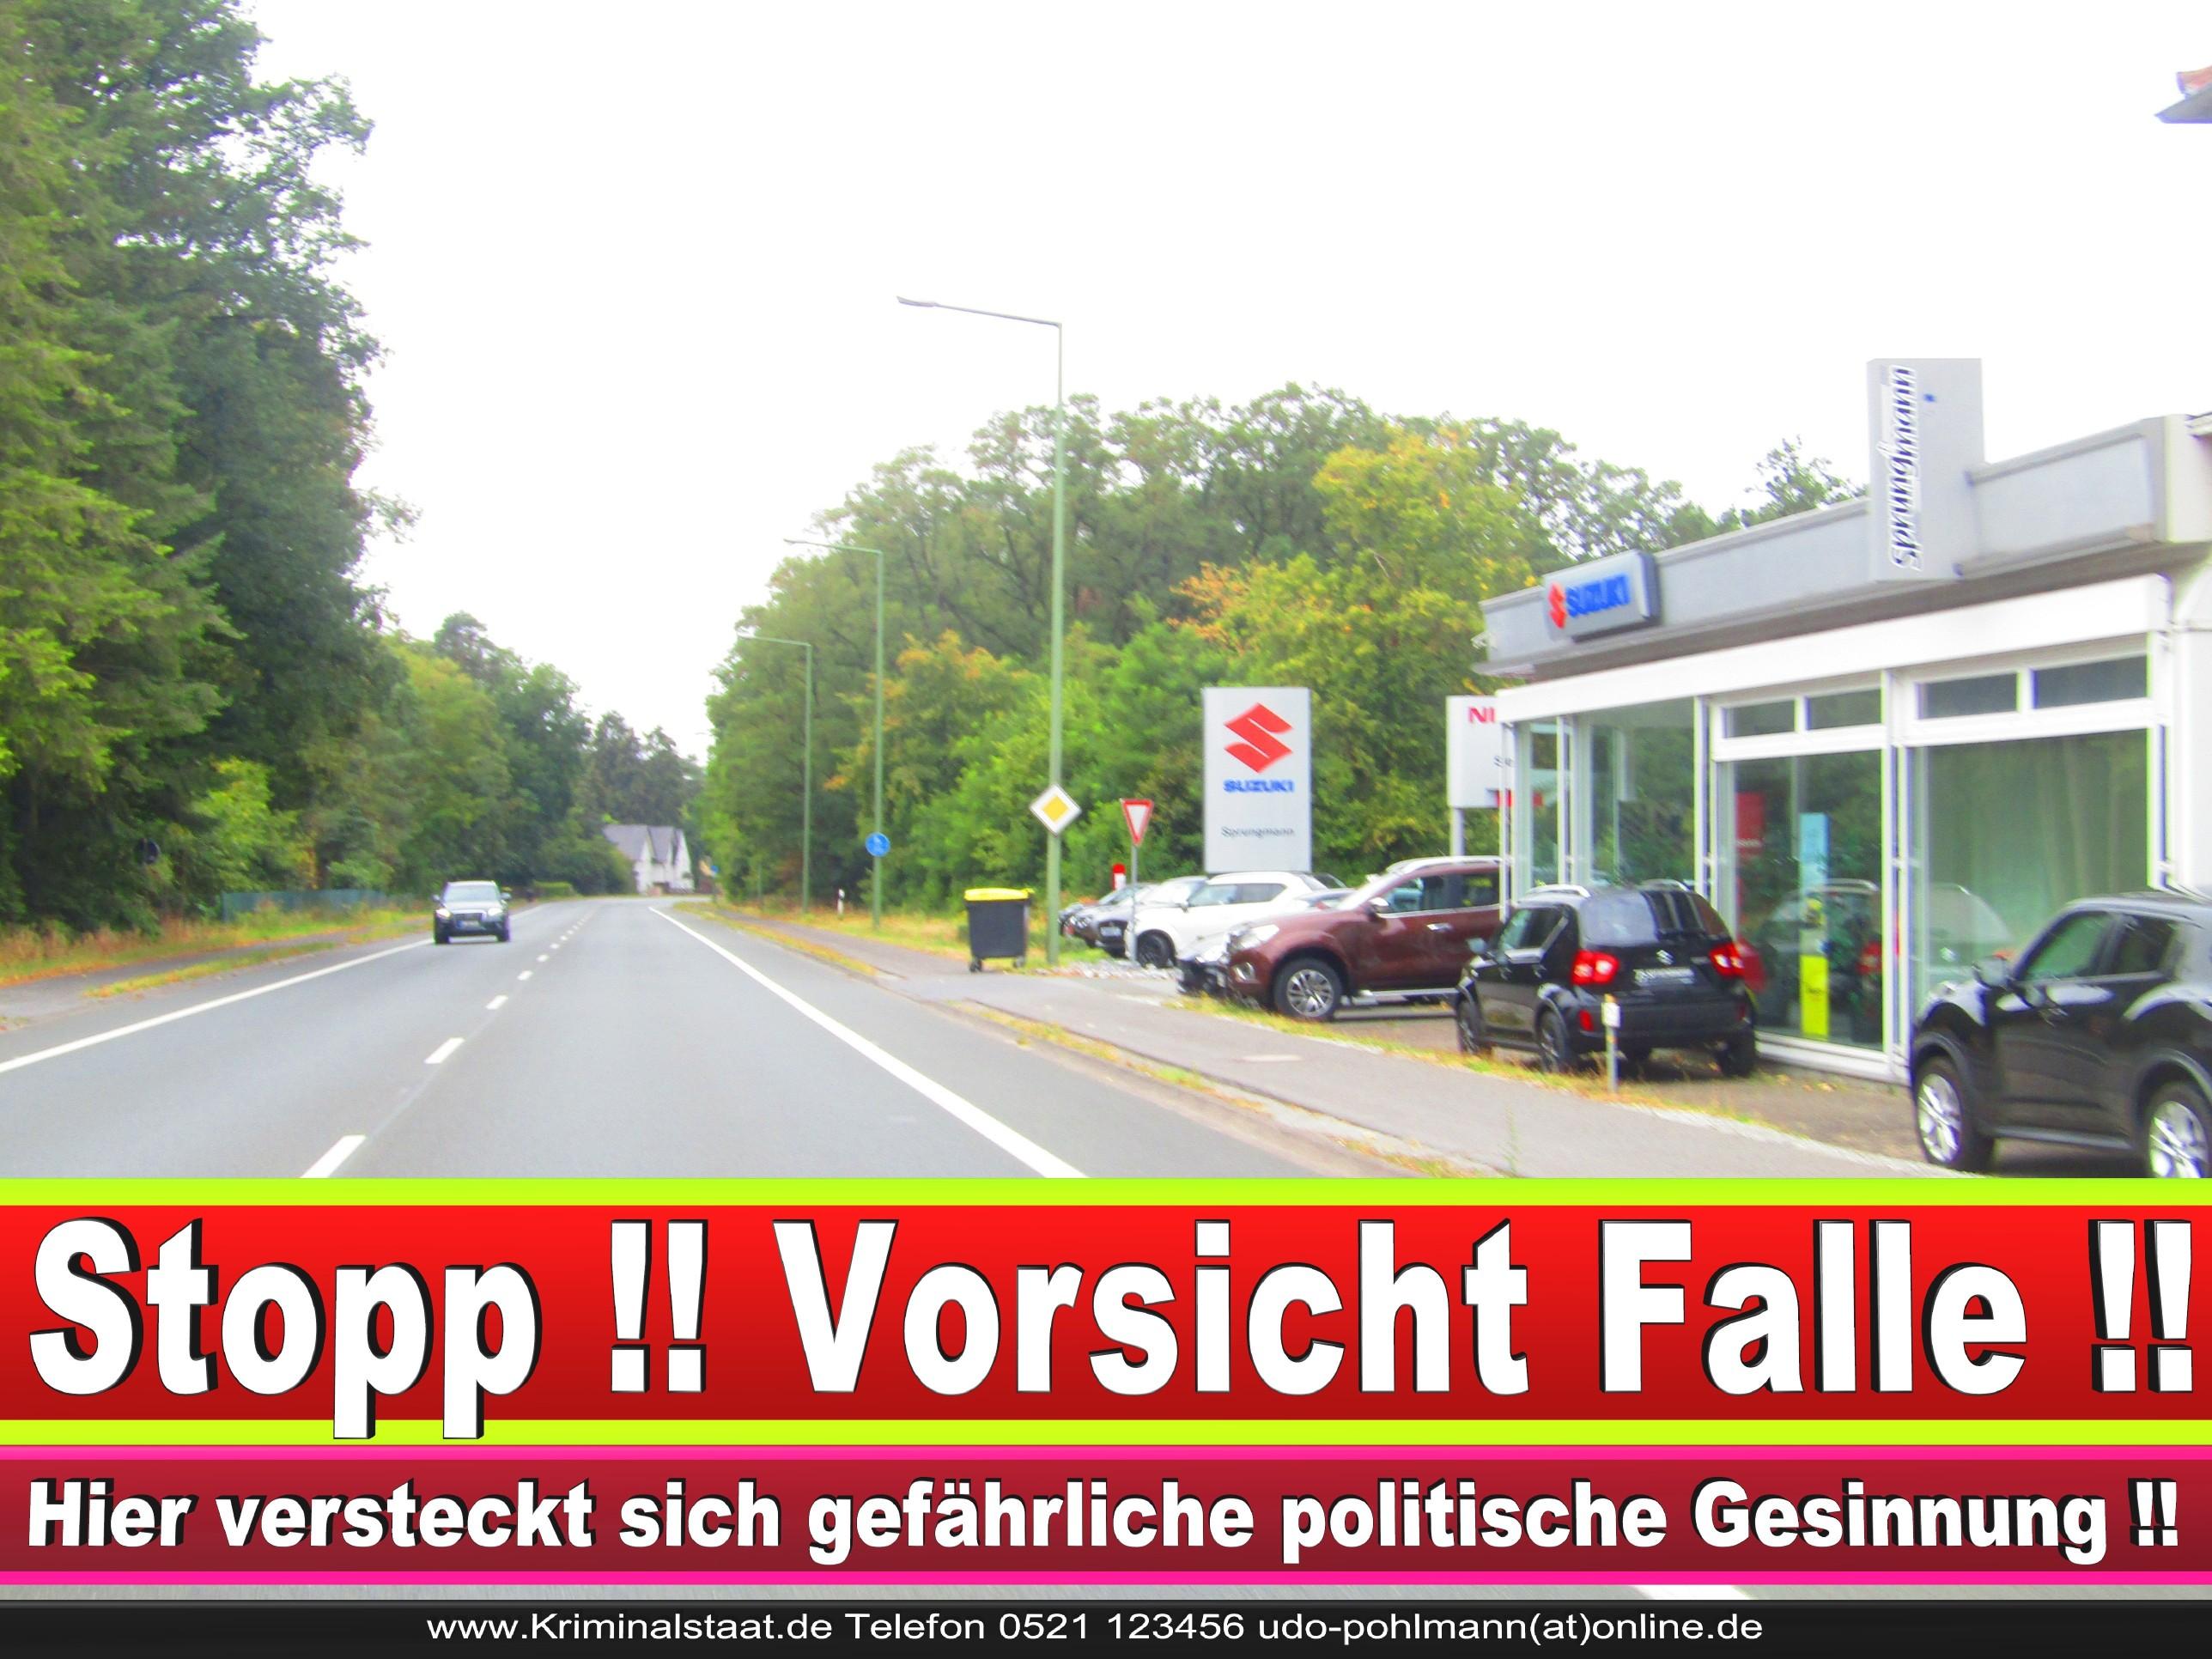 AUTOHAUS SPRUNGMANN CDU BIELEFELD 1 LANDTAGSWAHL BUNDESTAGSWAHL BÜRGERMEISTERWAHL